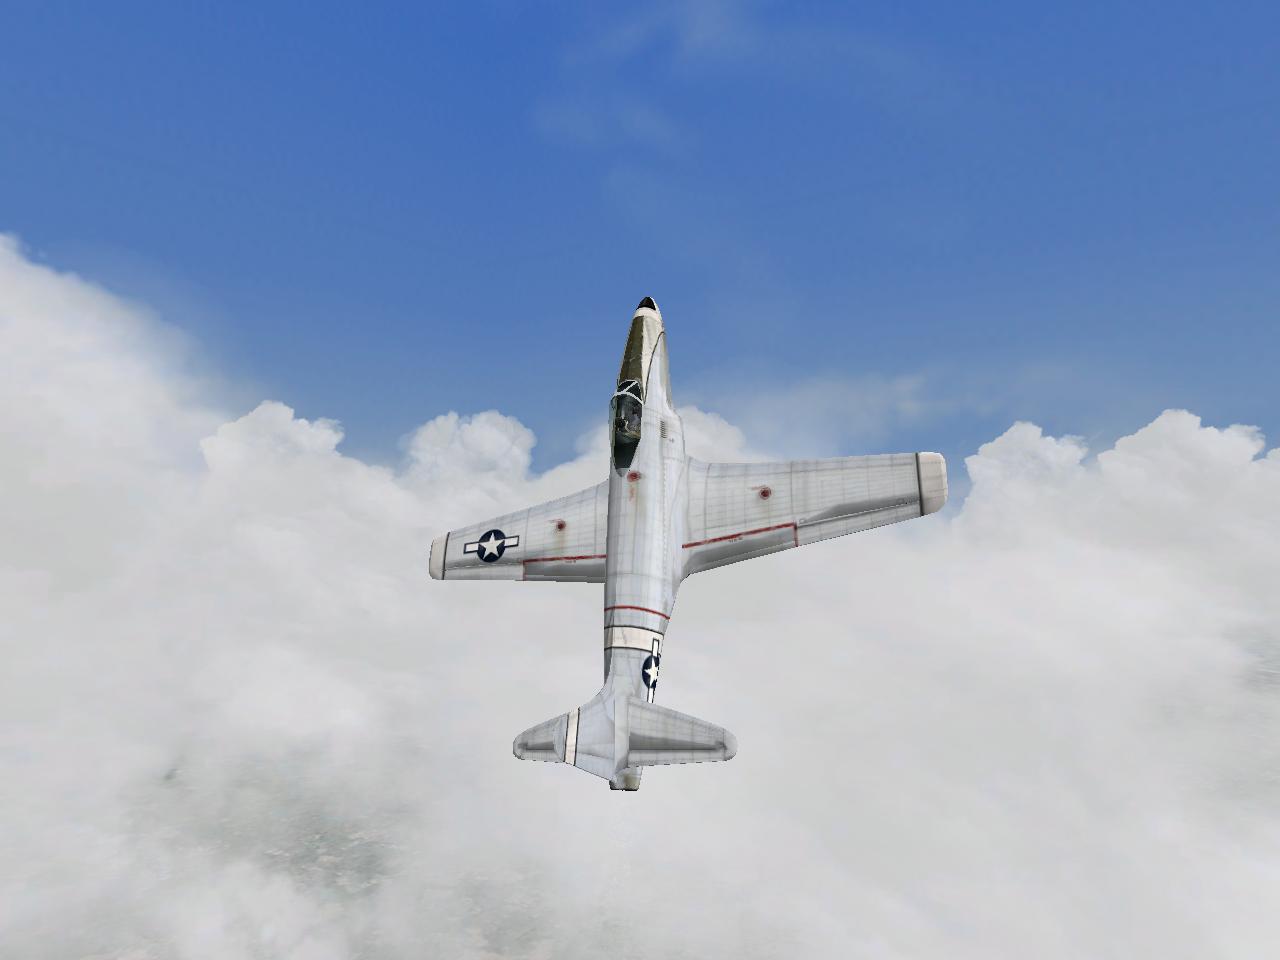 Download Microsoft Combat Flight Simulator 3: Battle for Europe